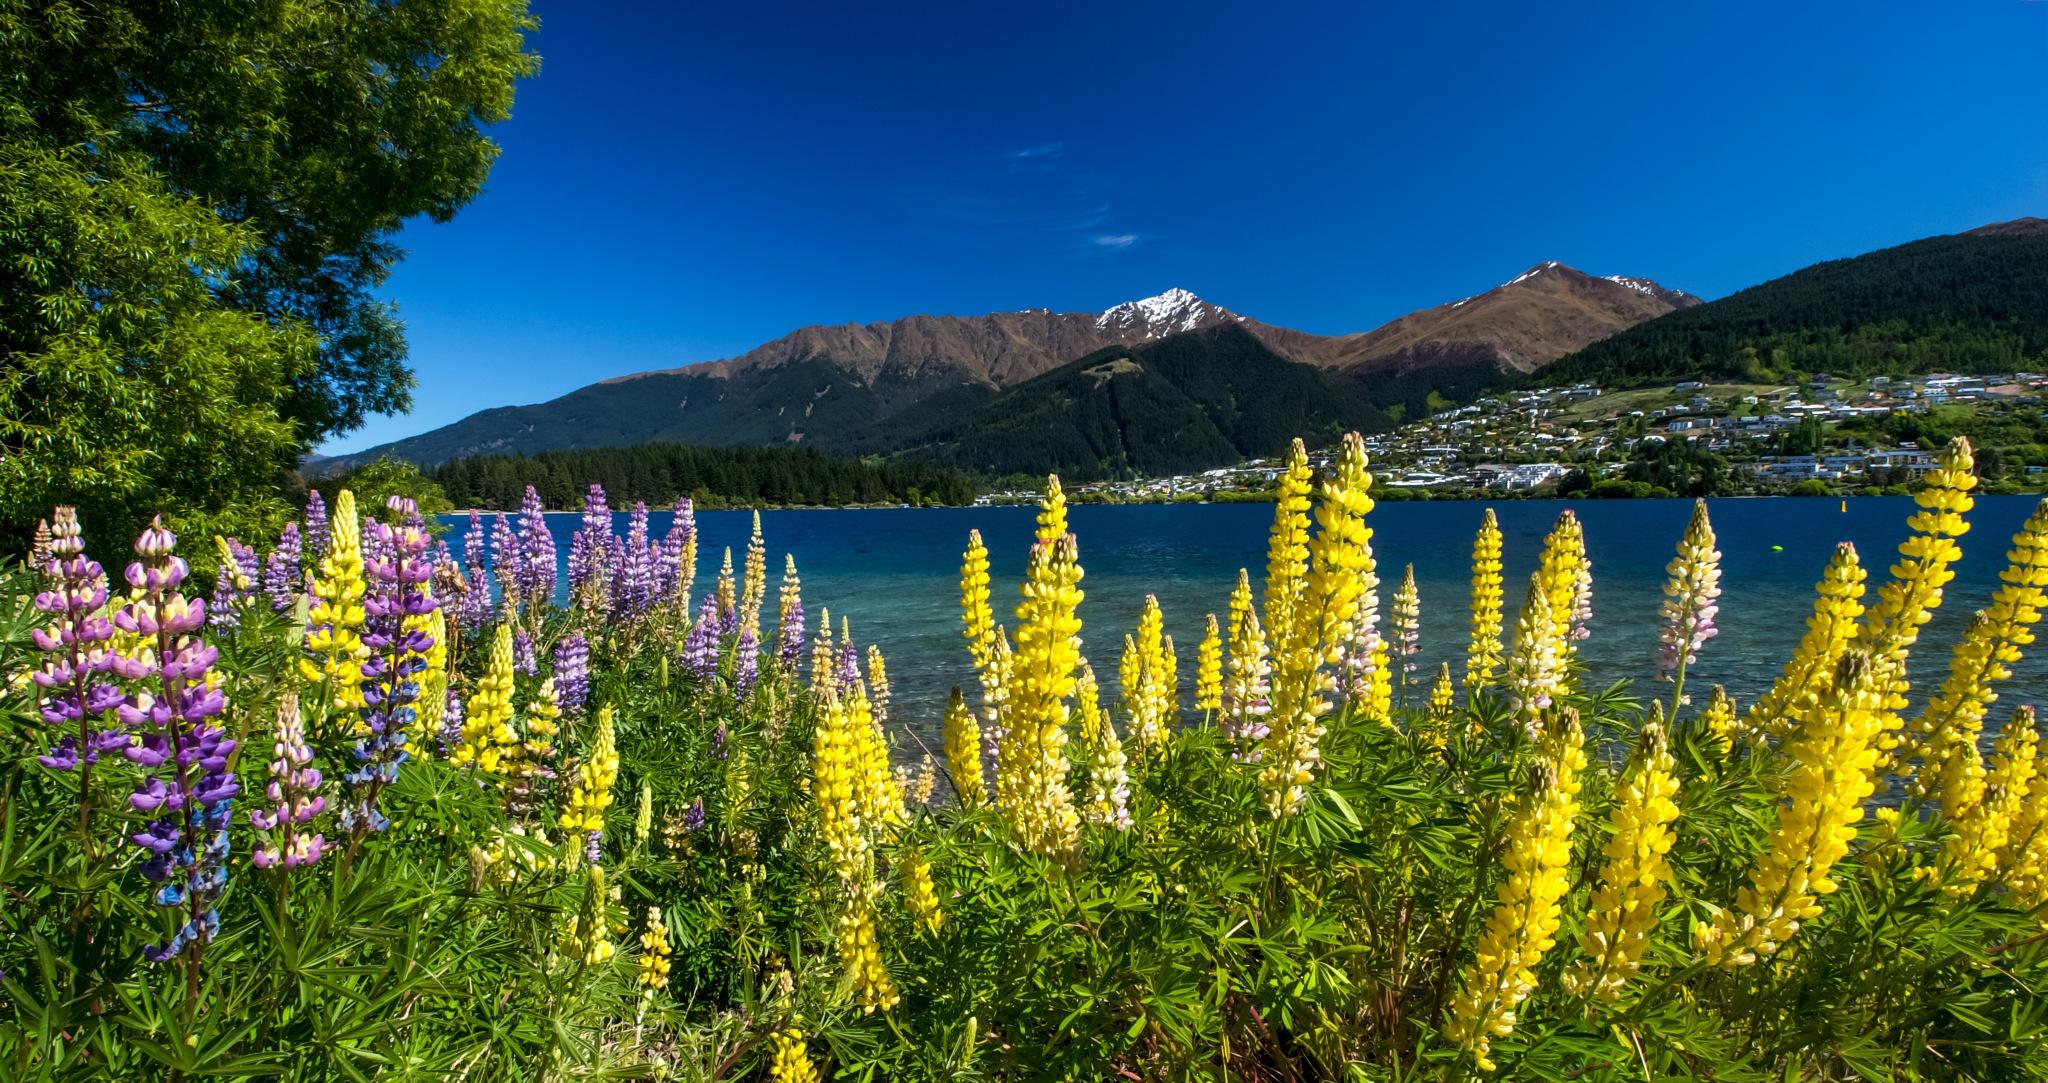 The lake by Peter Edwardo Vicente.